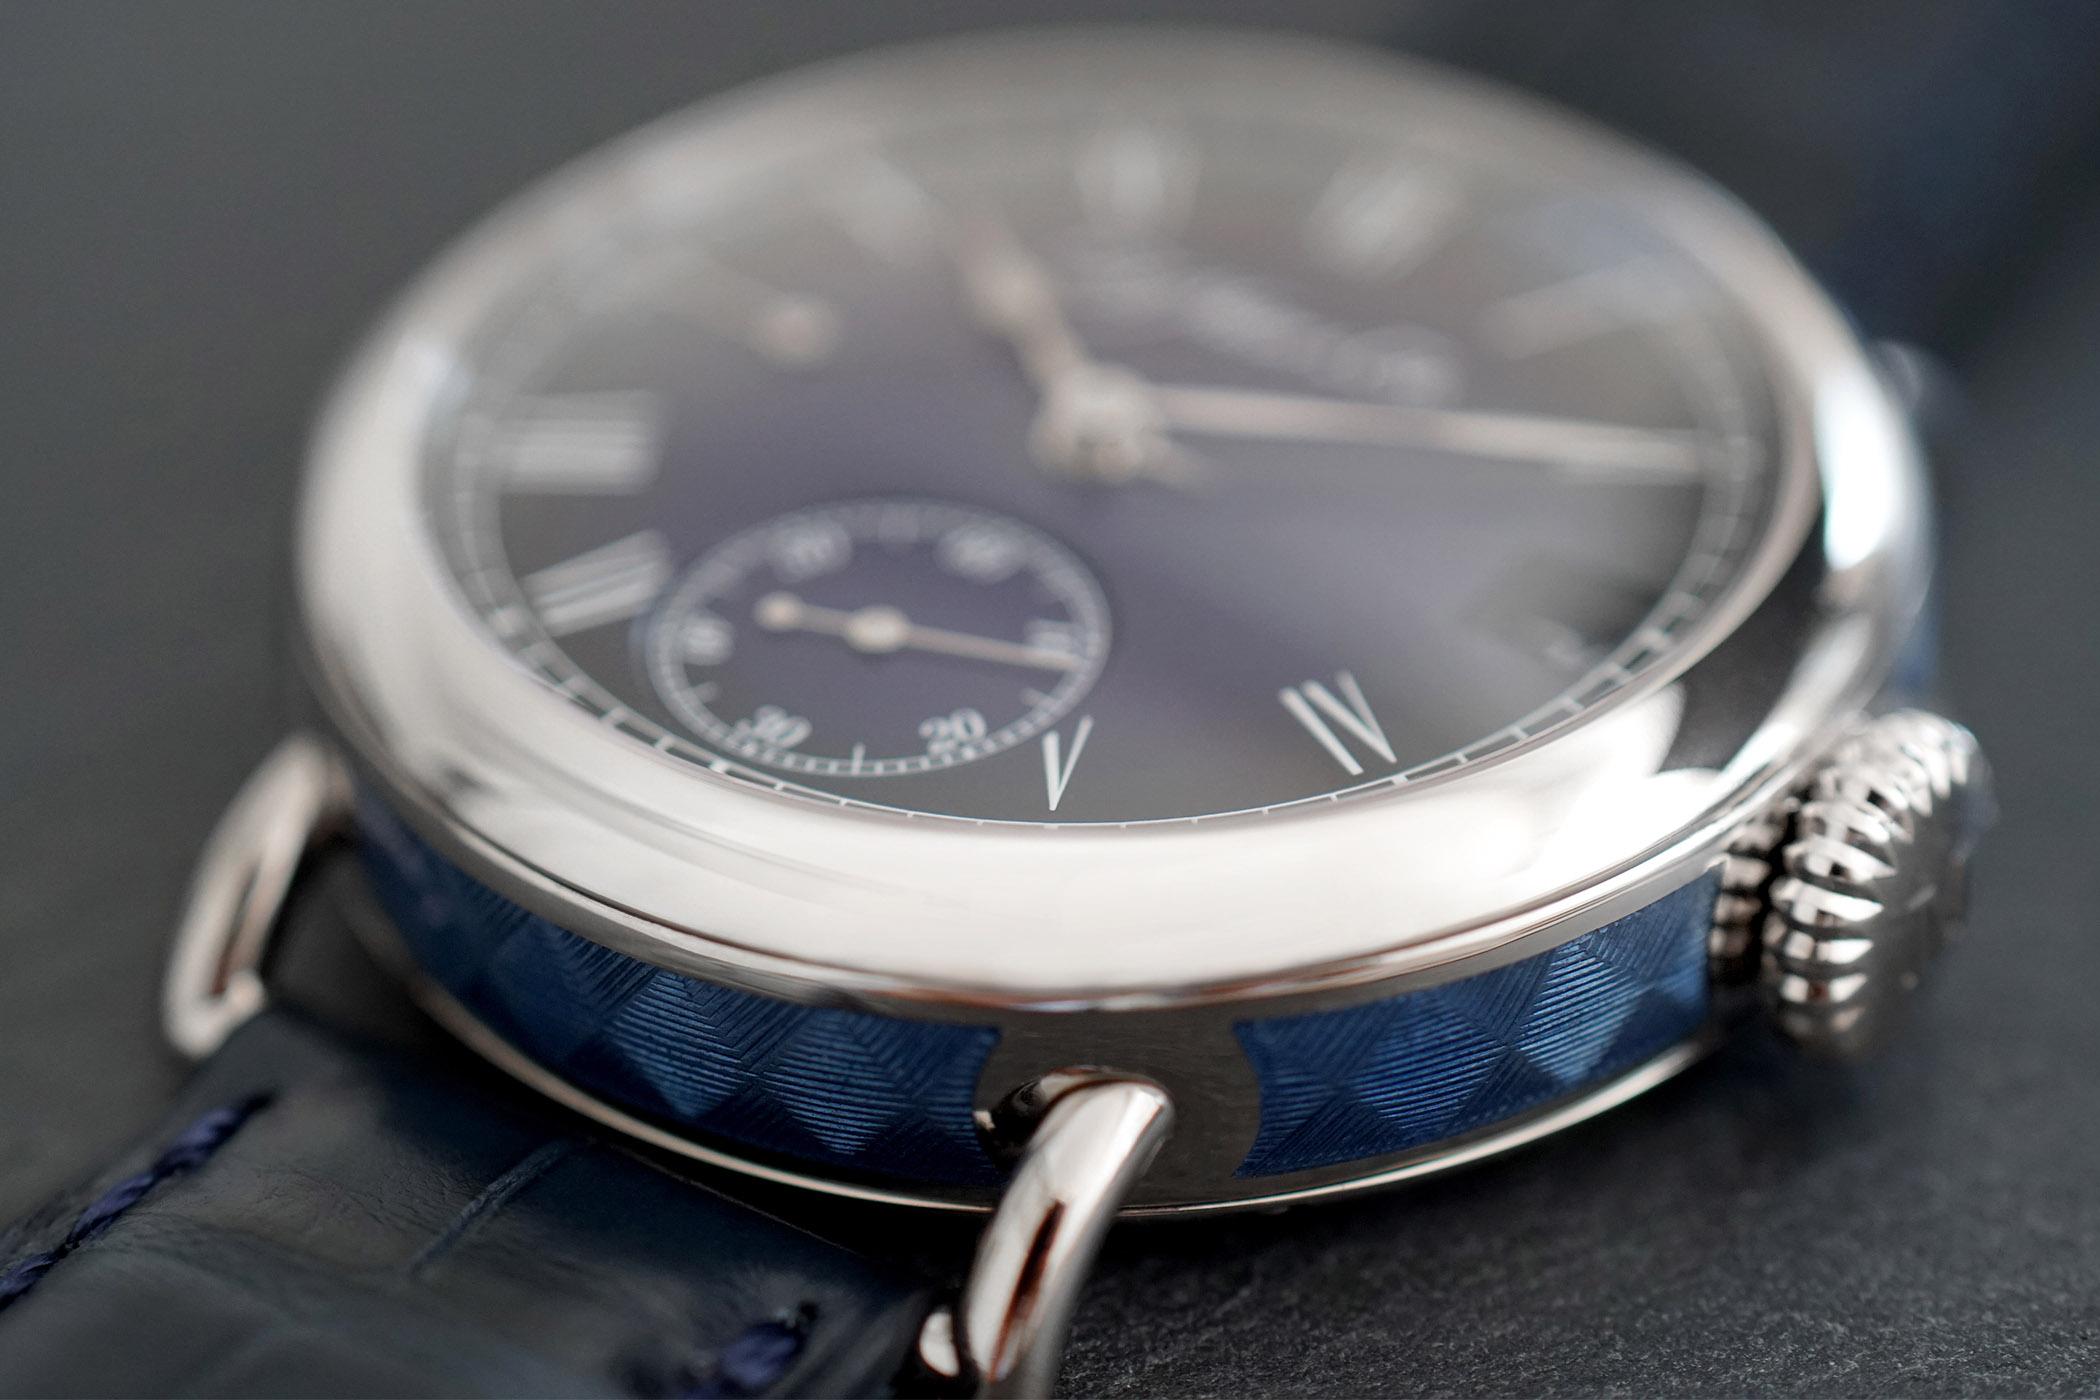 H Moser Cie Heritage Perpetual Calendar Midnight Blue Enamel 8800-0203